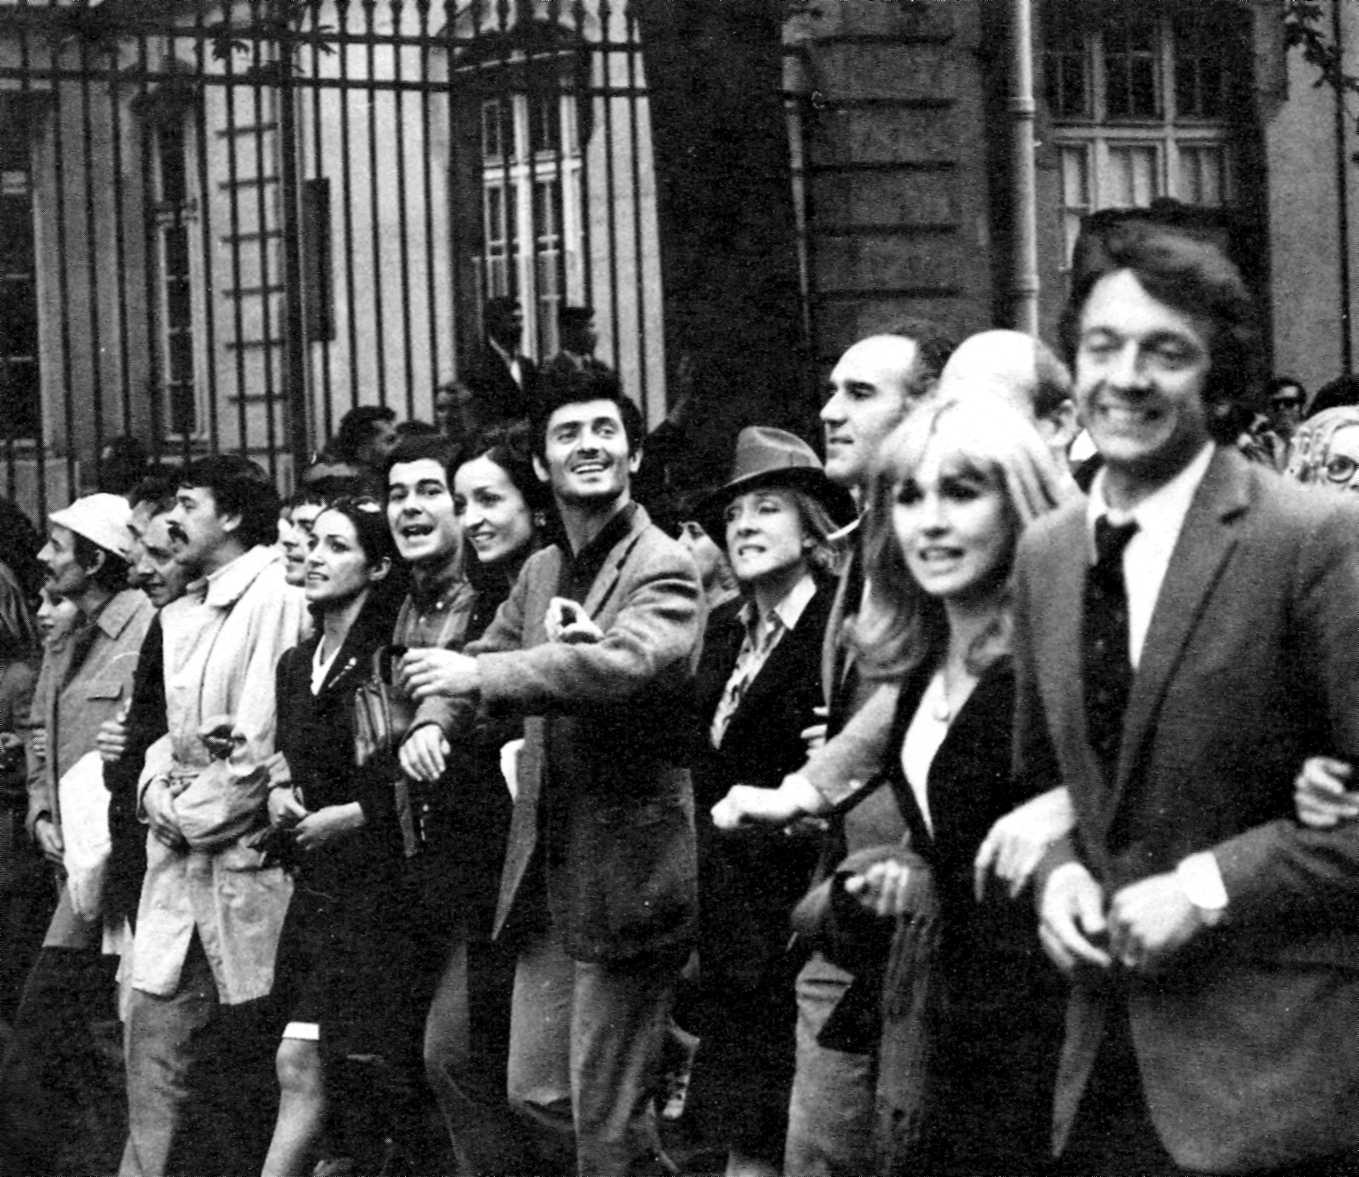 Manifestació de la gent de l'espectacle: Jean-Pierre Cassel, Michel Piccoli, Micheline Presle, Samy Frey, François Fabian, Jacques Brel i Jean Ferrat, entre d'altres